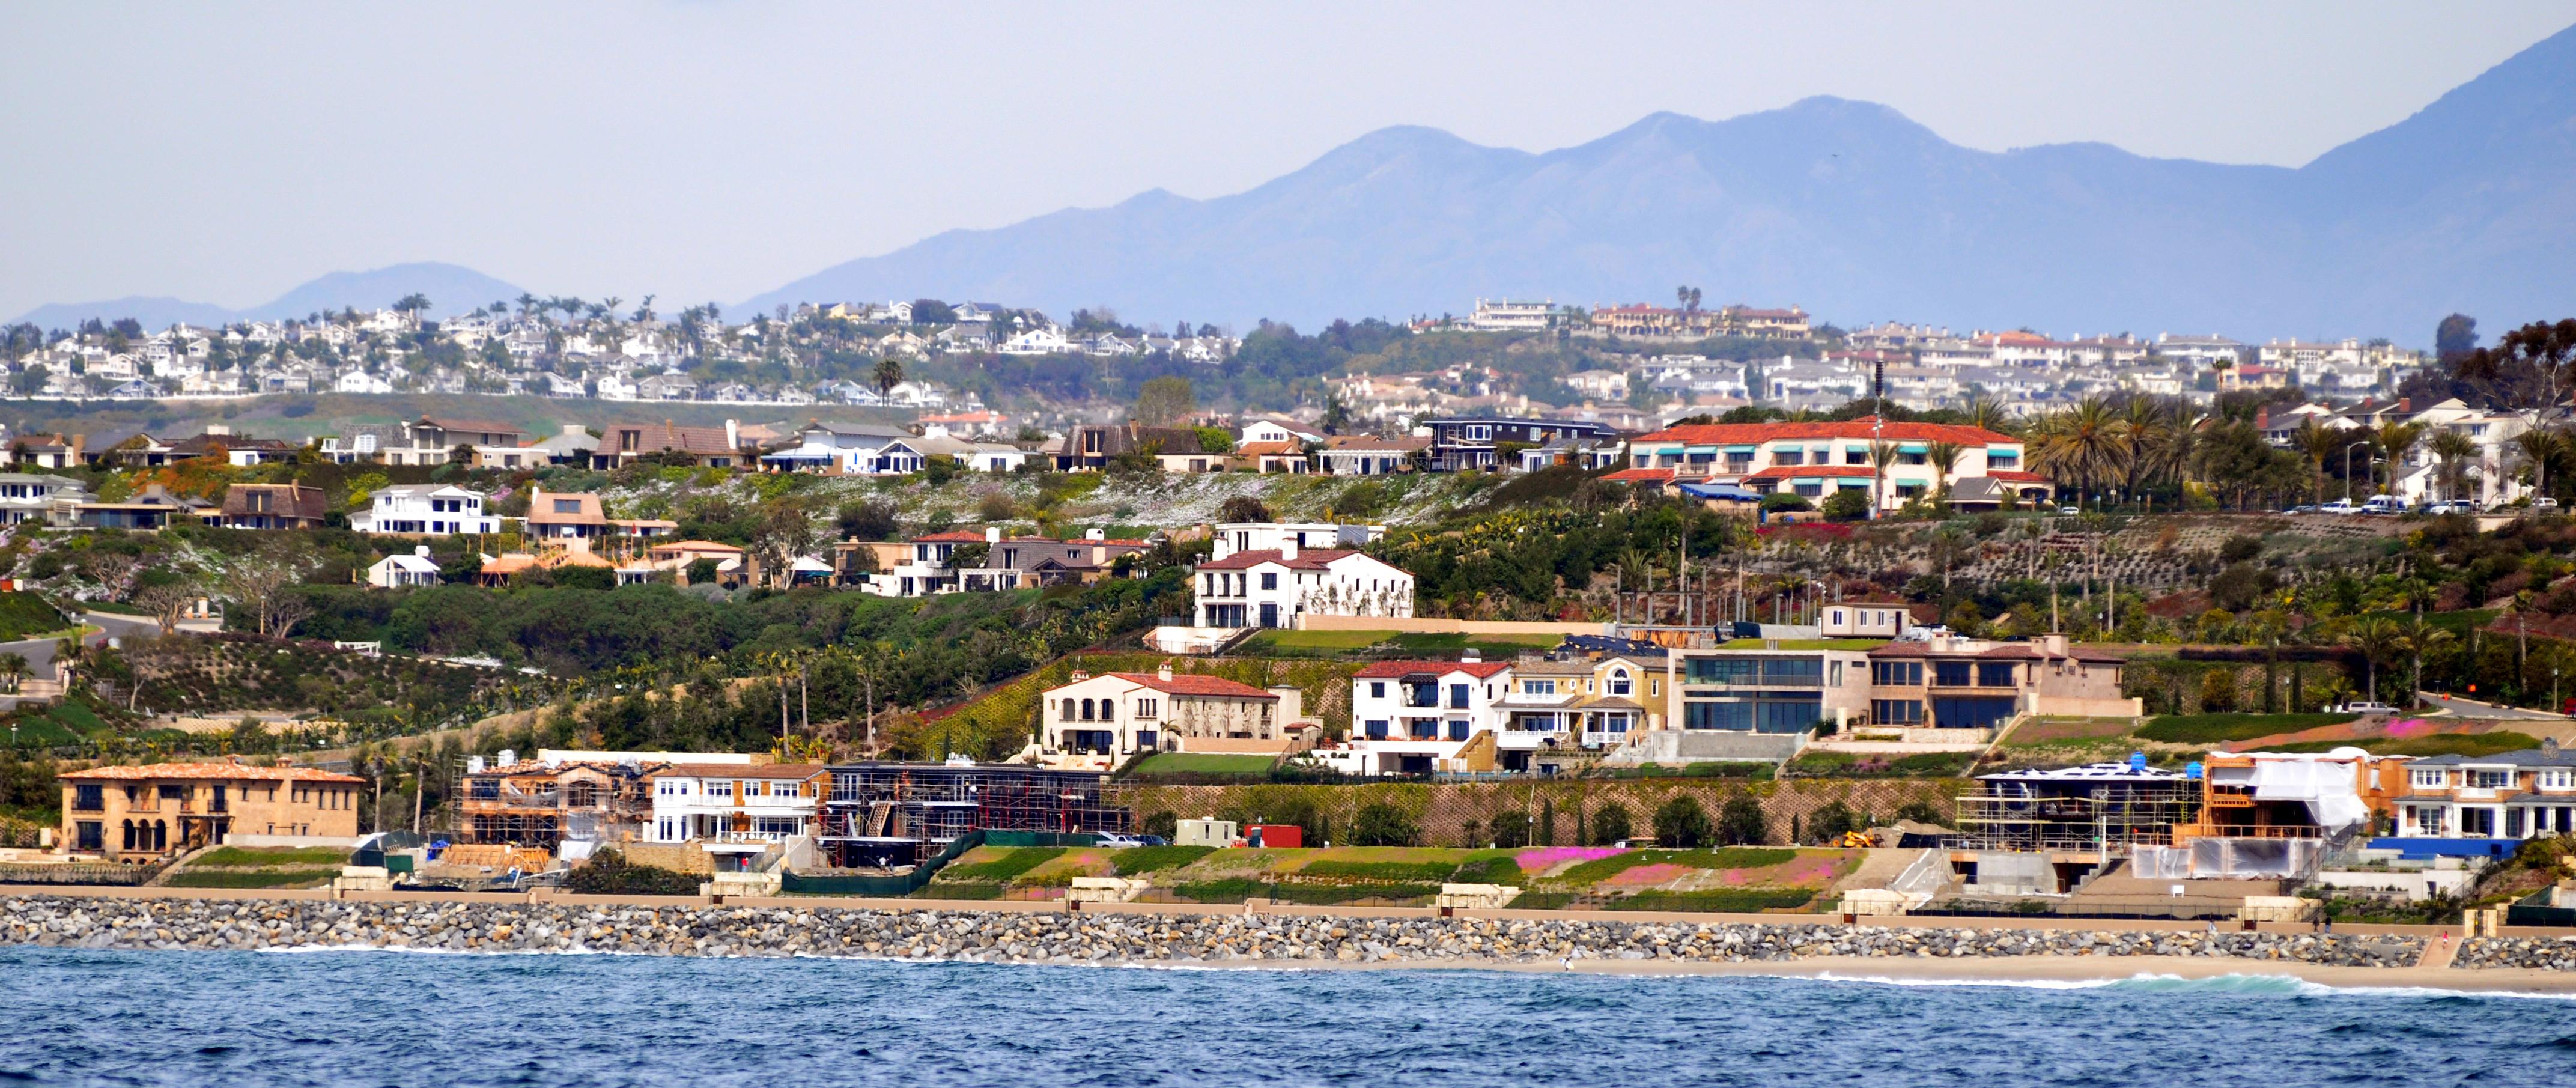 Best Laguna Beach Art Galleries